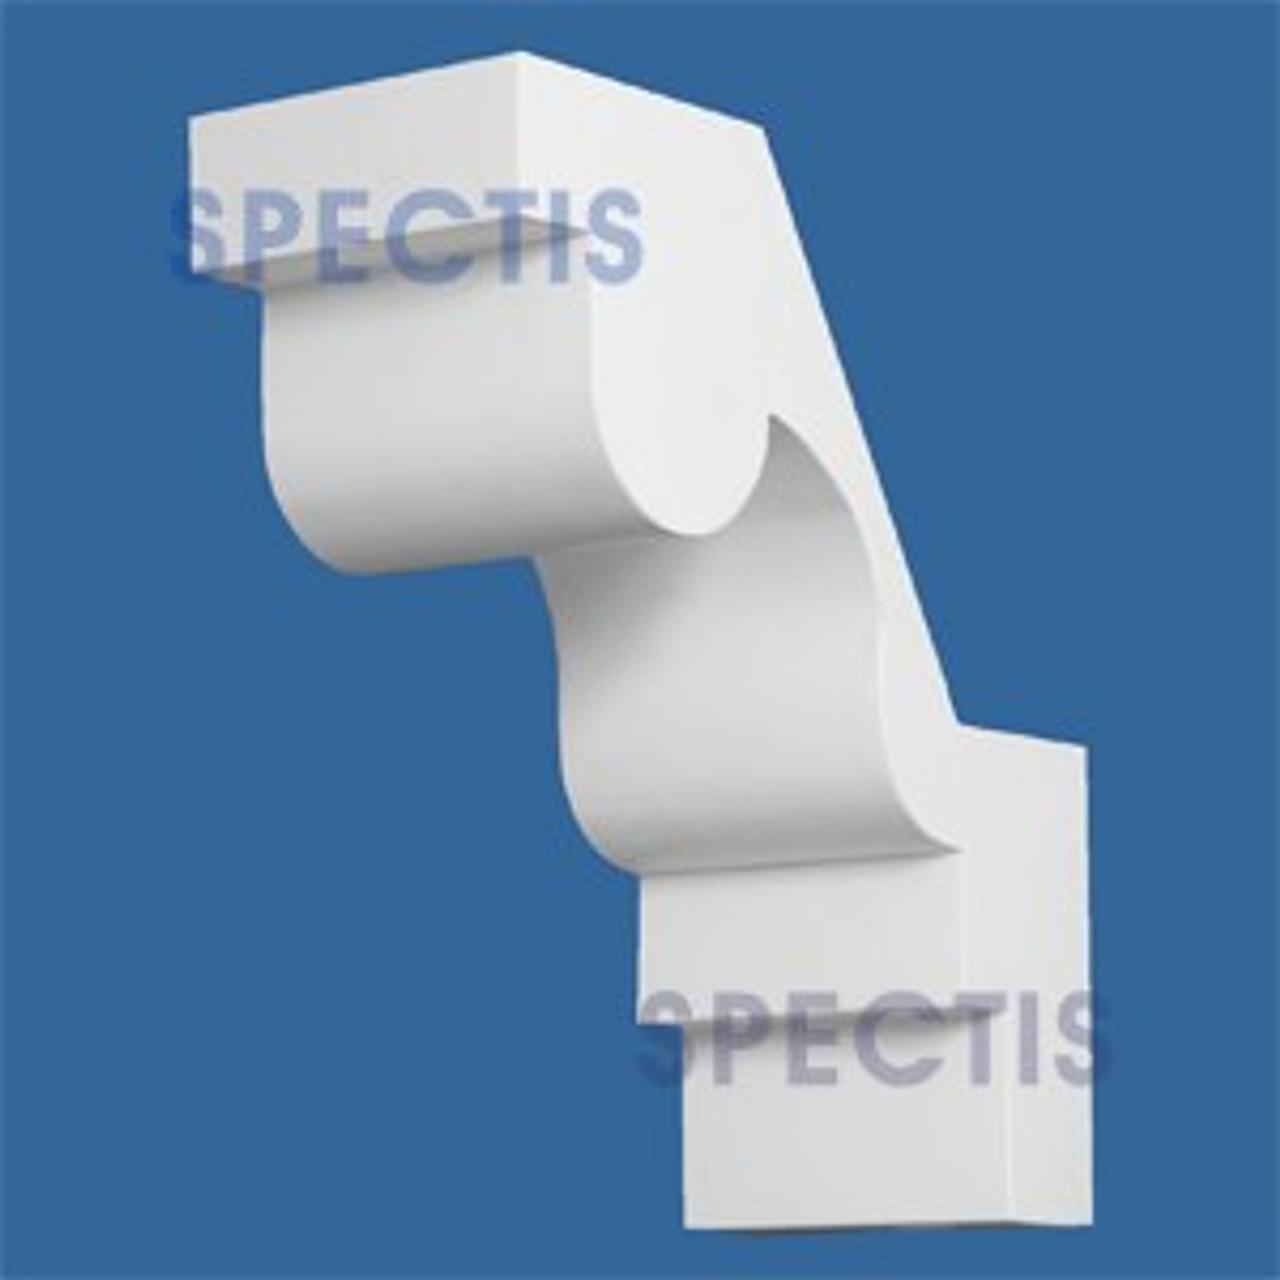 "BL2579 Corbel Block or Eave Bracket 7.75""W x 19.5""H x 17.25"" P"